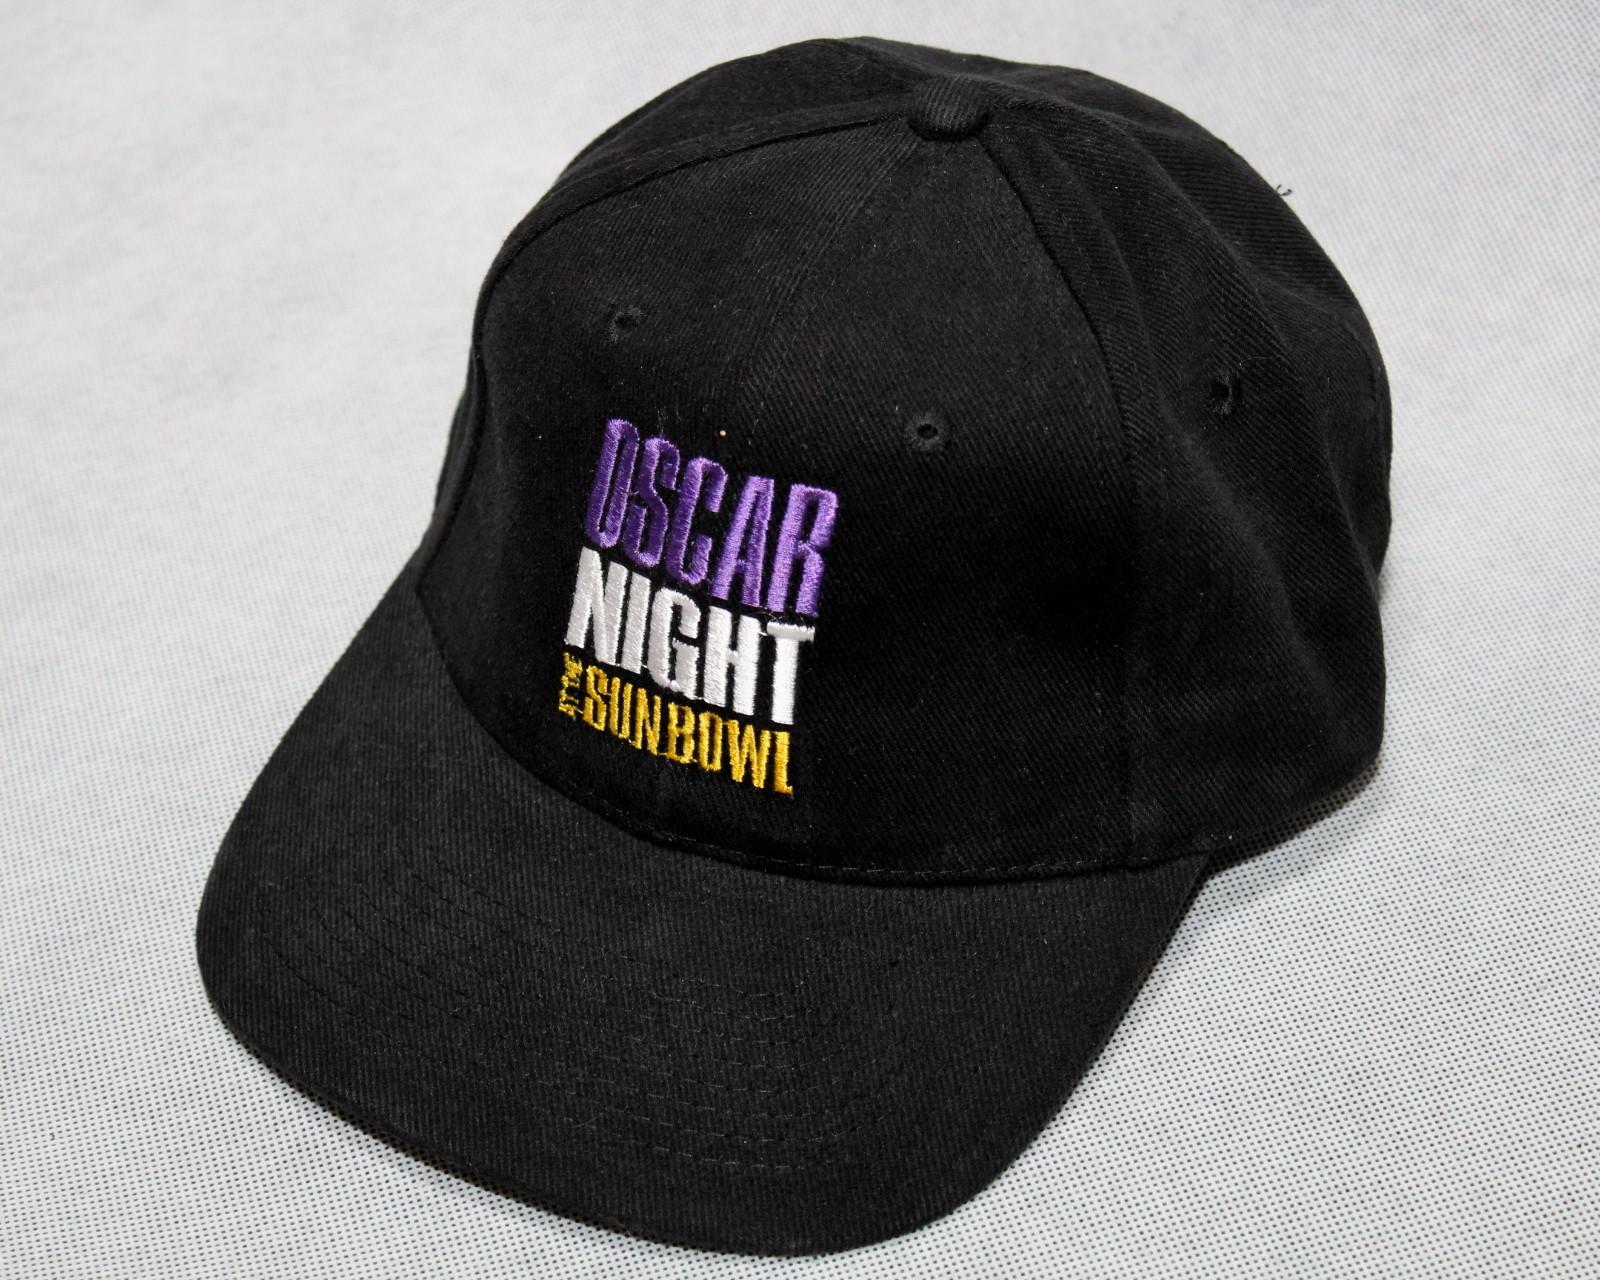 【DEADSTOCK!】Oscar De La Hoya (オスカー・デ・ラ・ホーヤ) vs Patrick Charpentier (パトリック・シャルパンティエ) ベースボールキャップ | ironfist